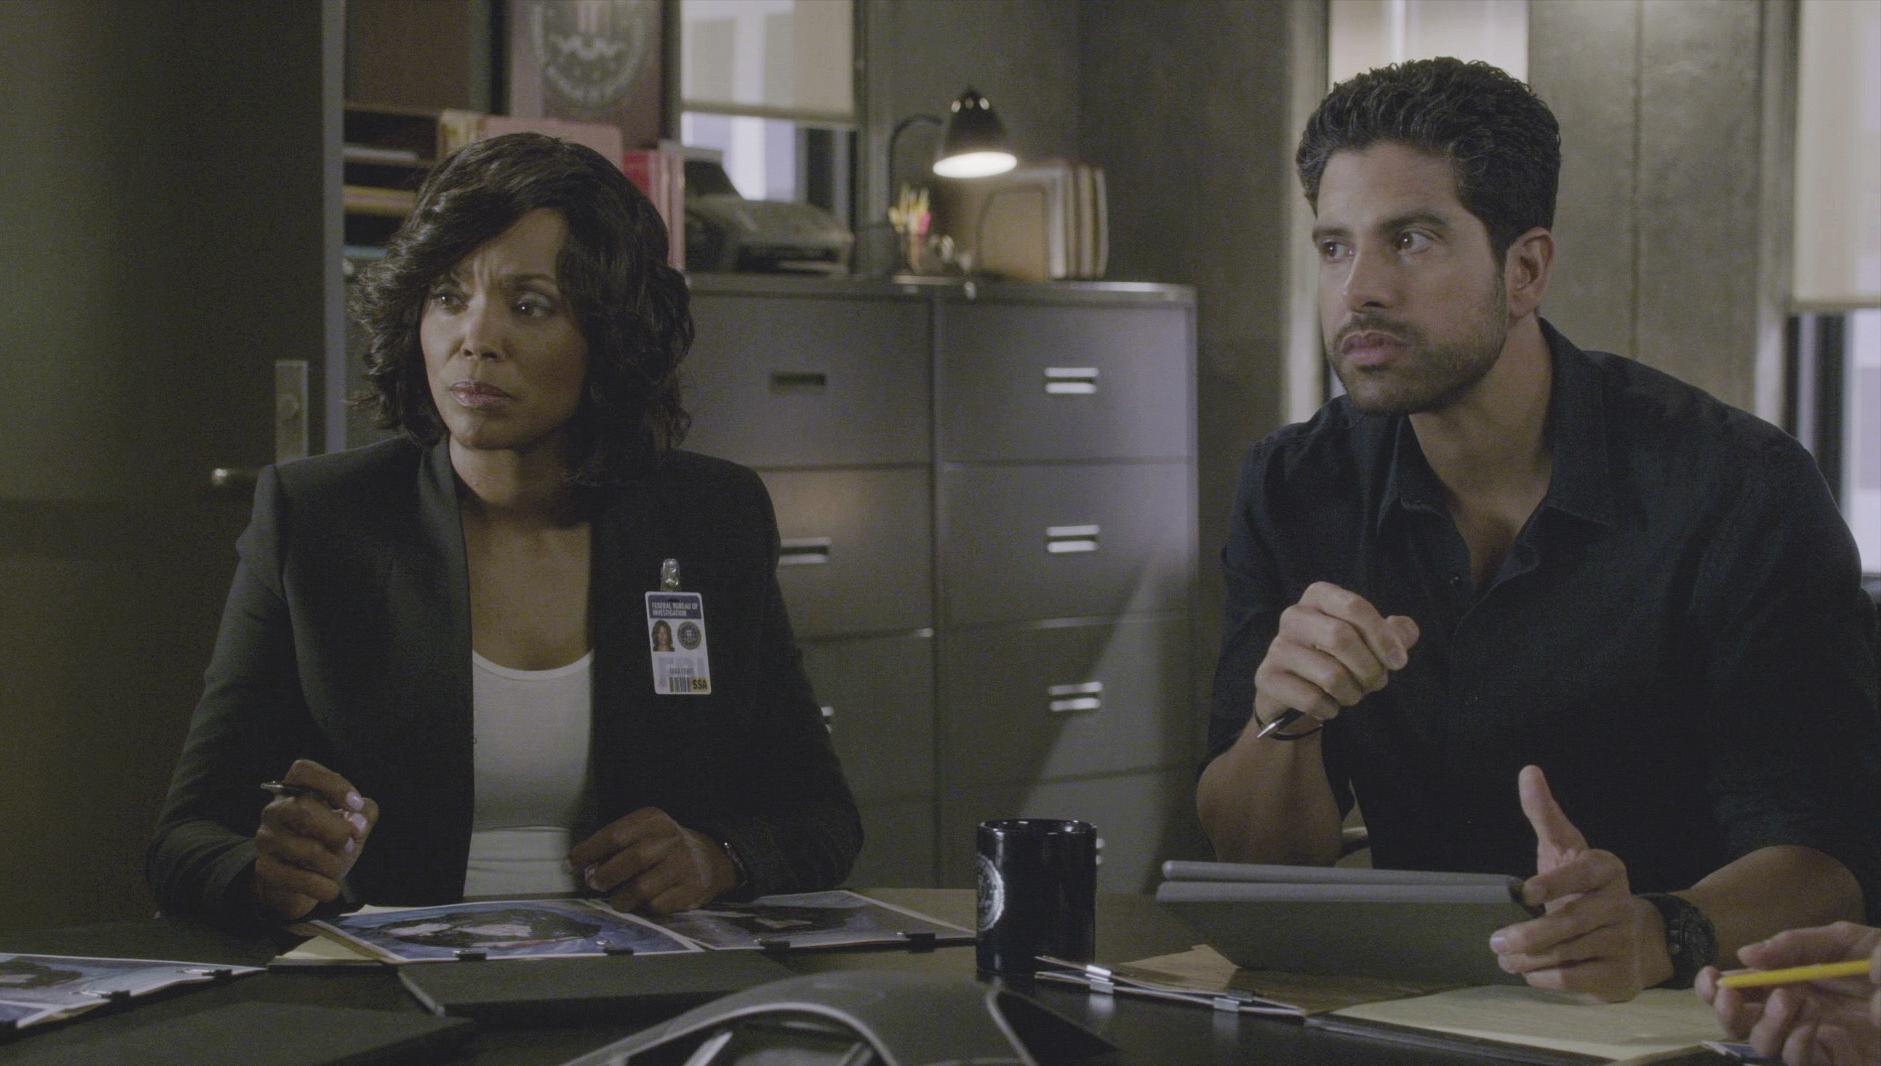 Dr. Lewis and Agent Alvez discuss the case.